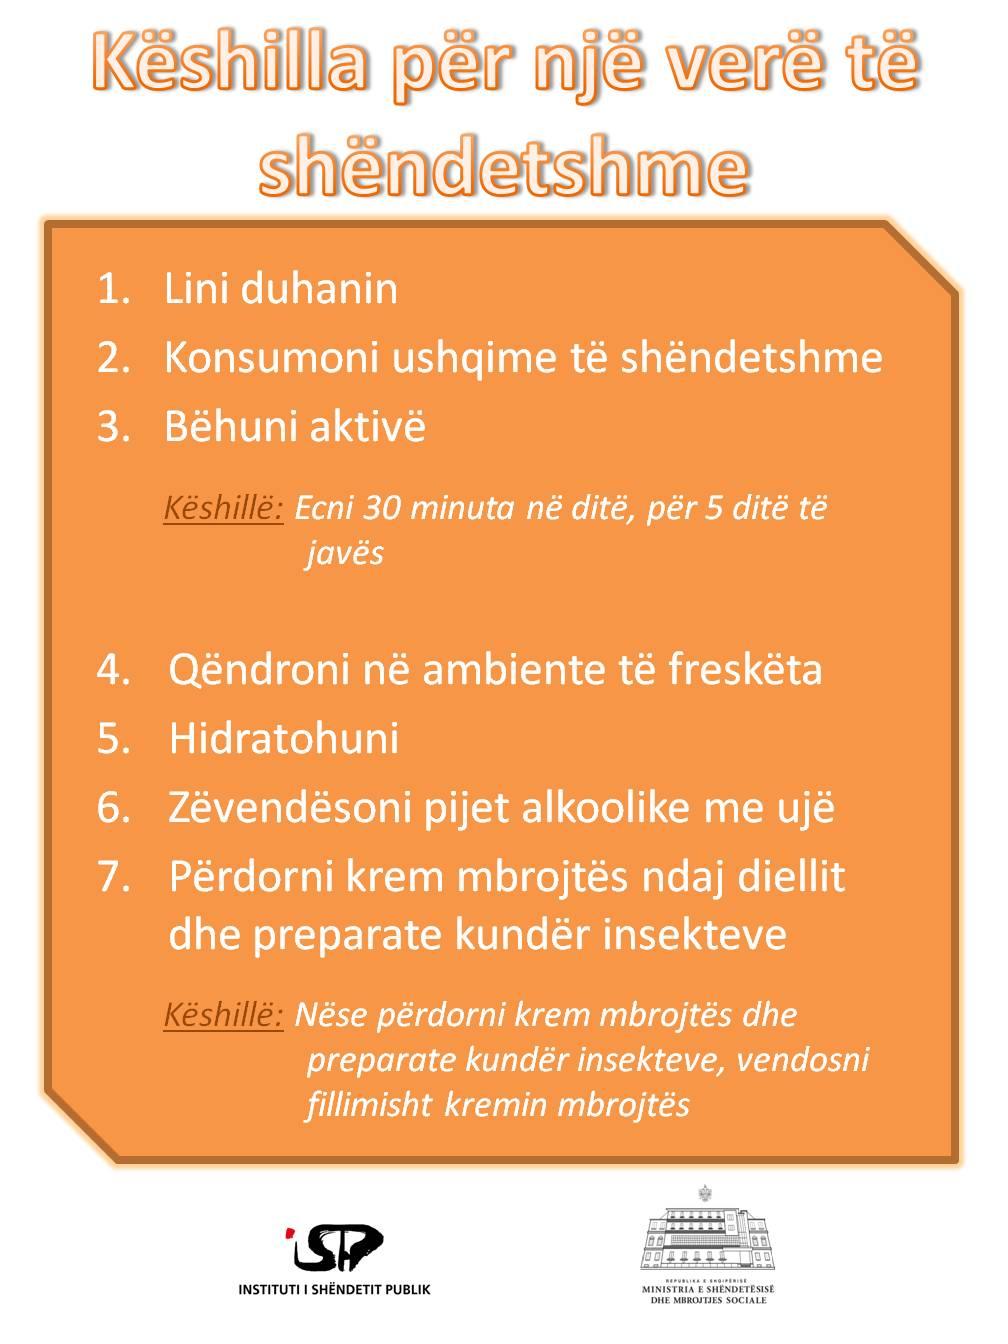 8. vere e shendetshme